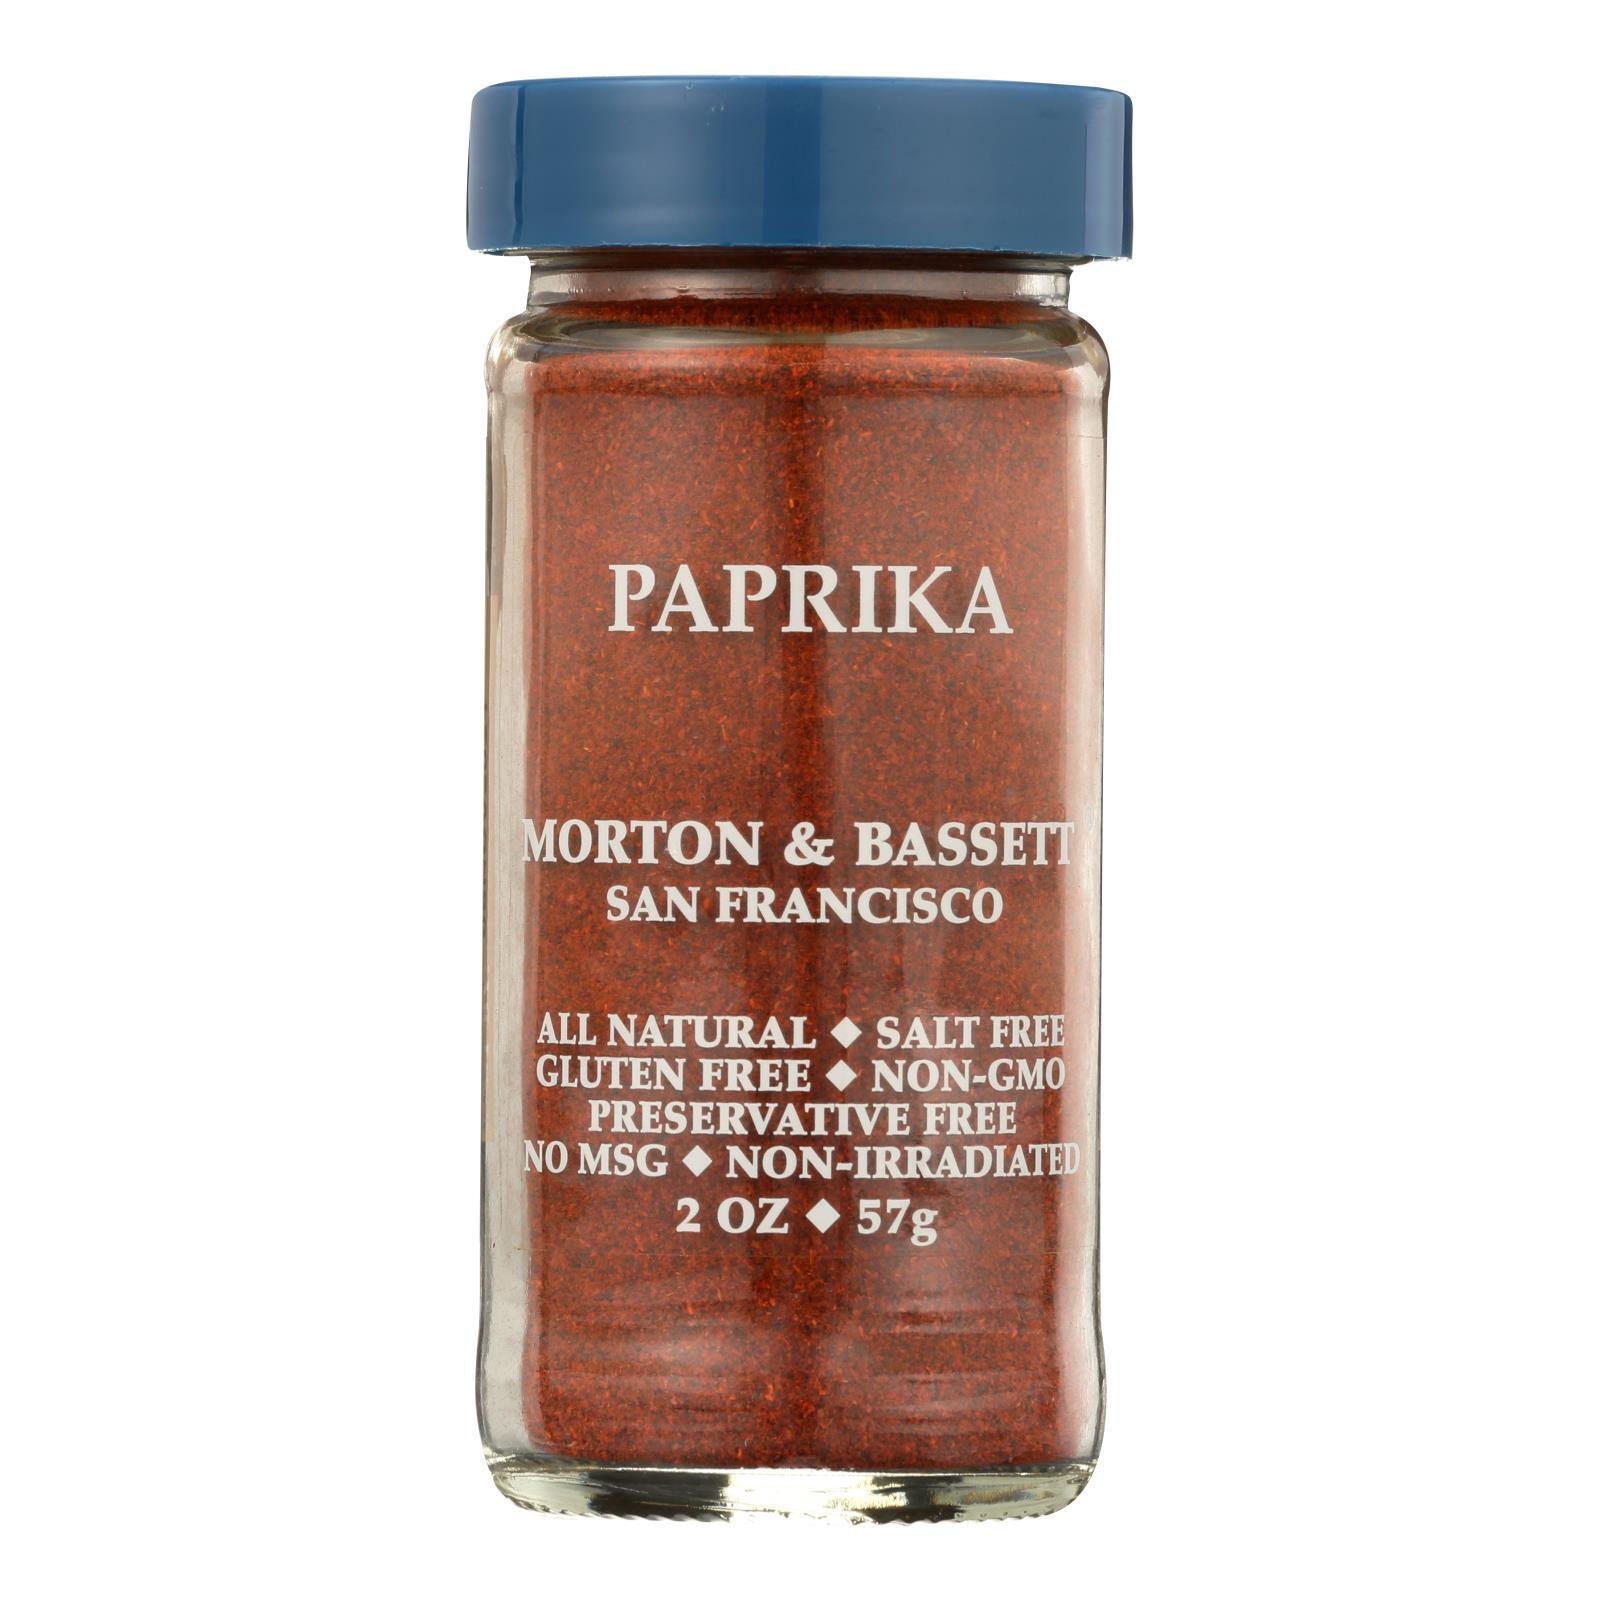 Morton and Bassett Seasoning - Paprika - 2 oz - Case of 3